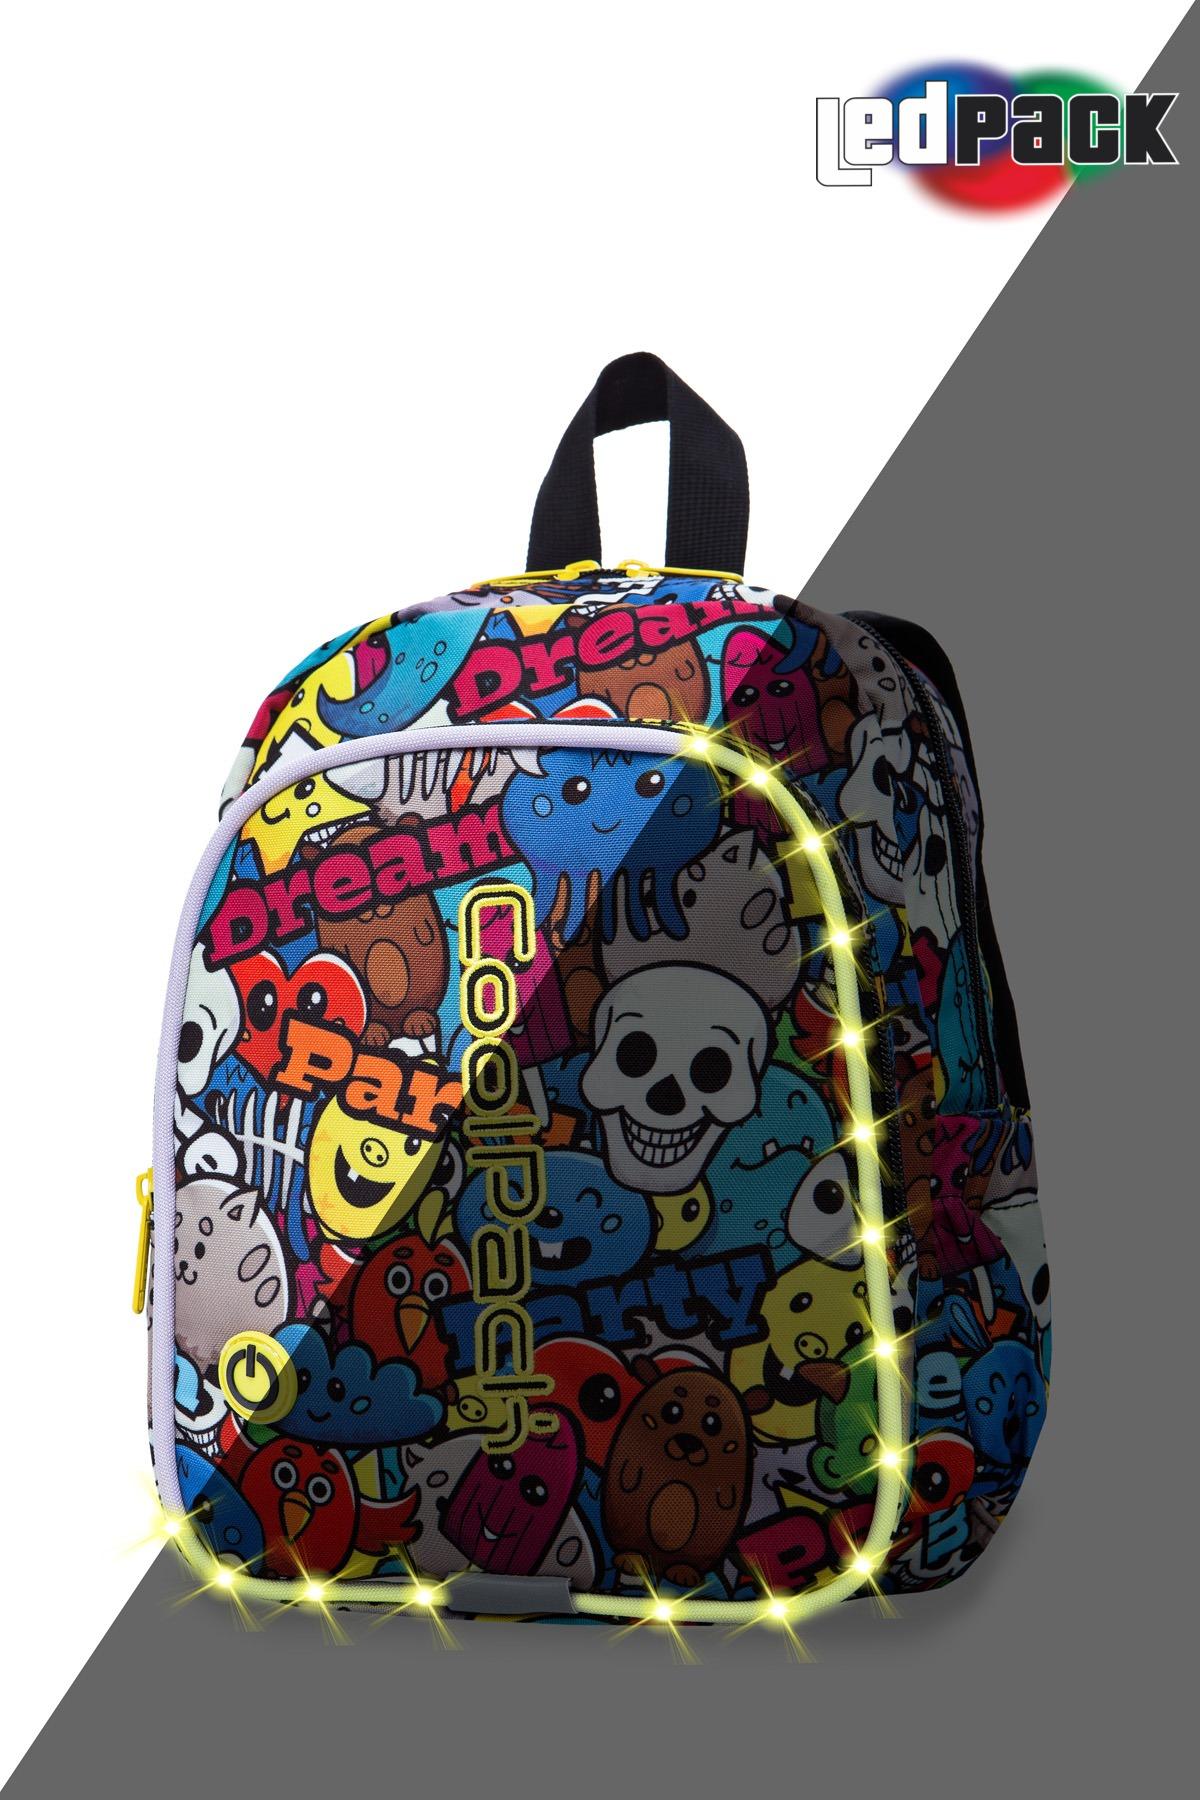 Coolpack - bobby - kids backpack - led cartoon